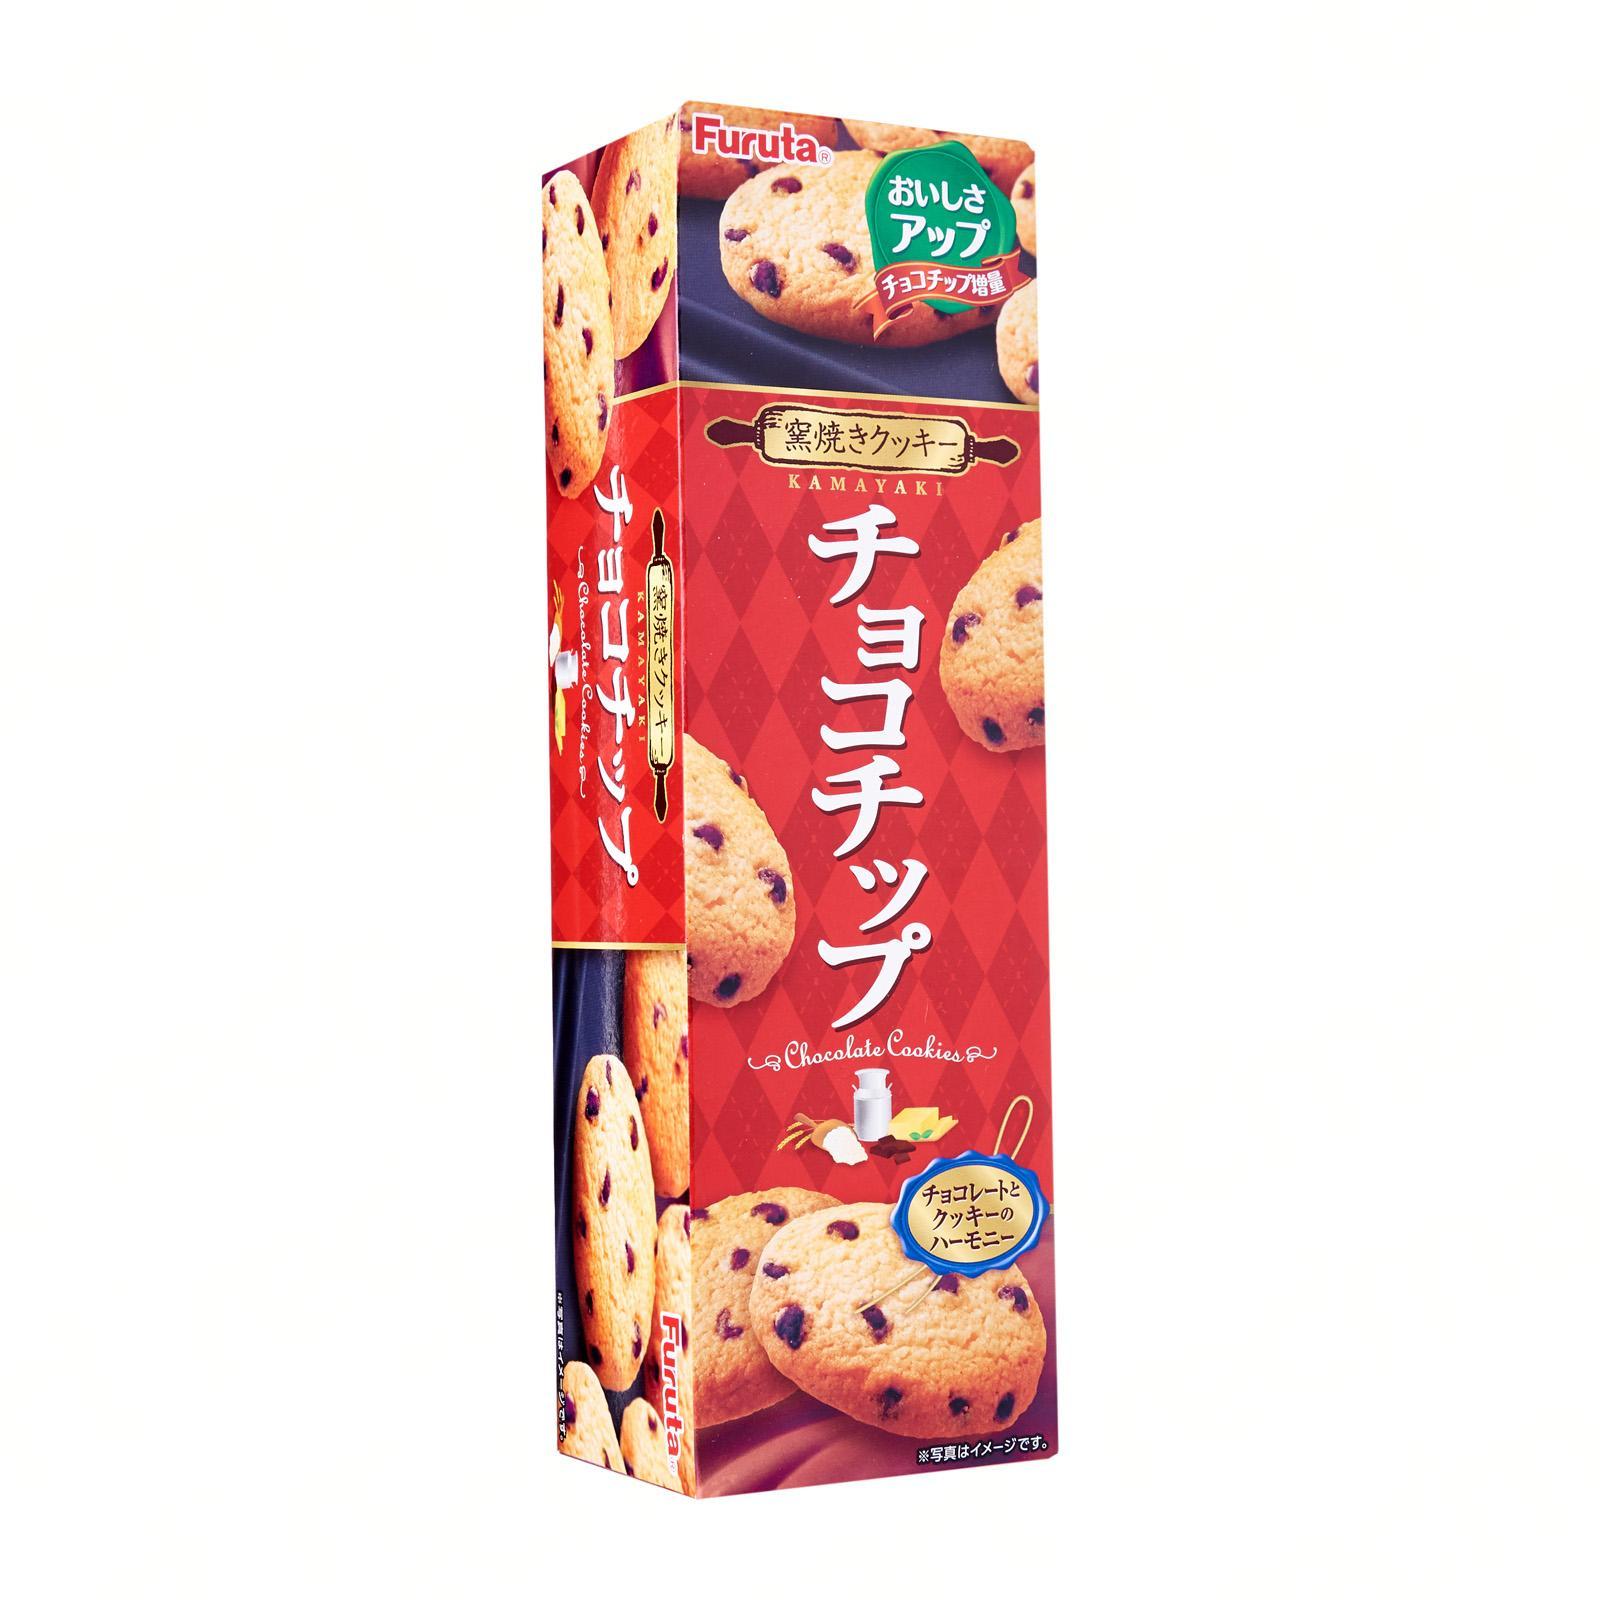 Kirei Furata - Japan Chocolate Chips Cookies Snack 80.4G